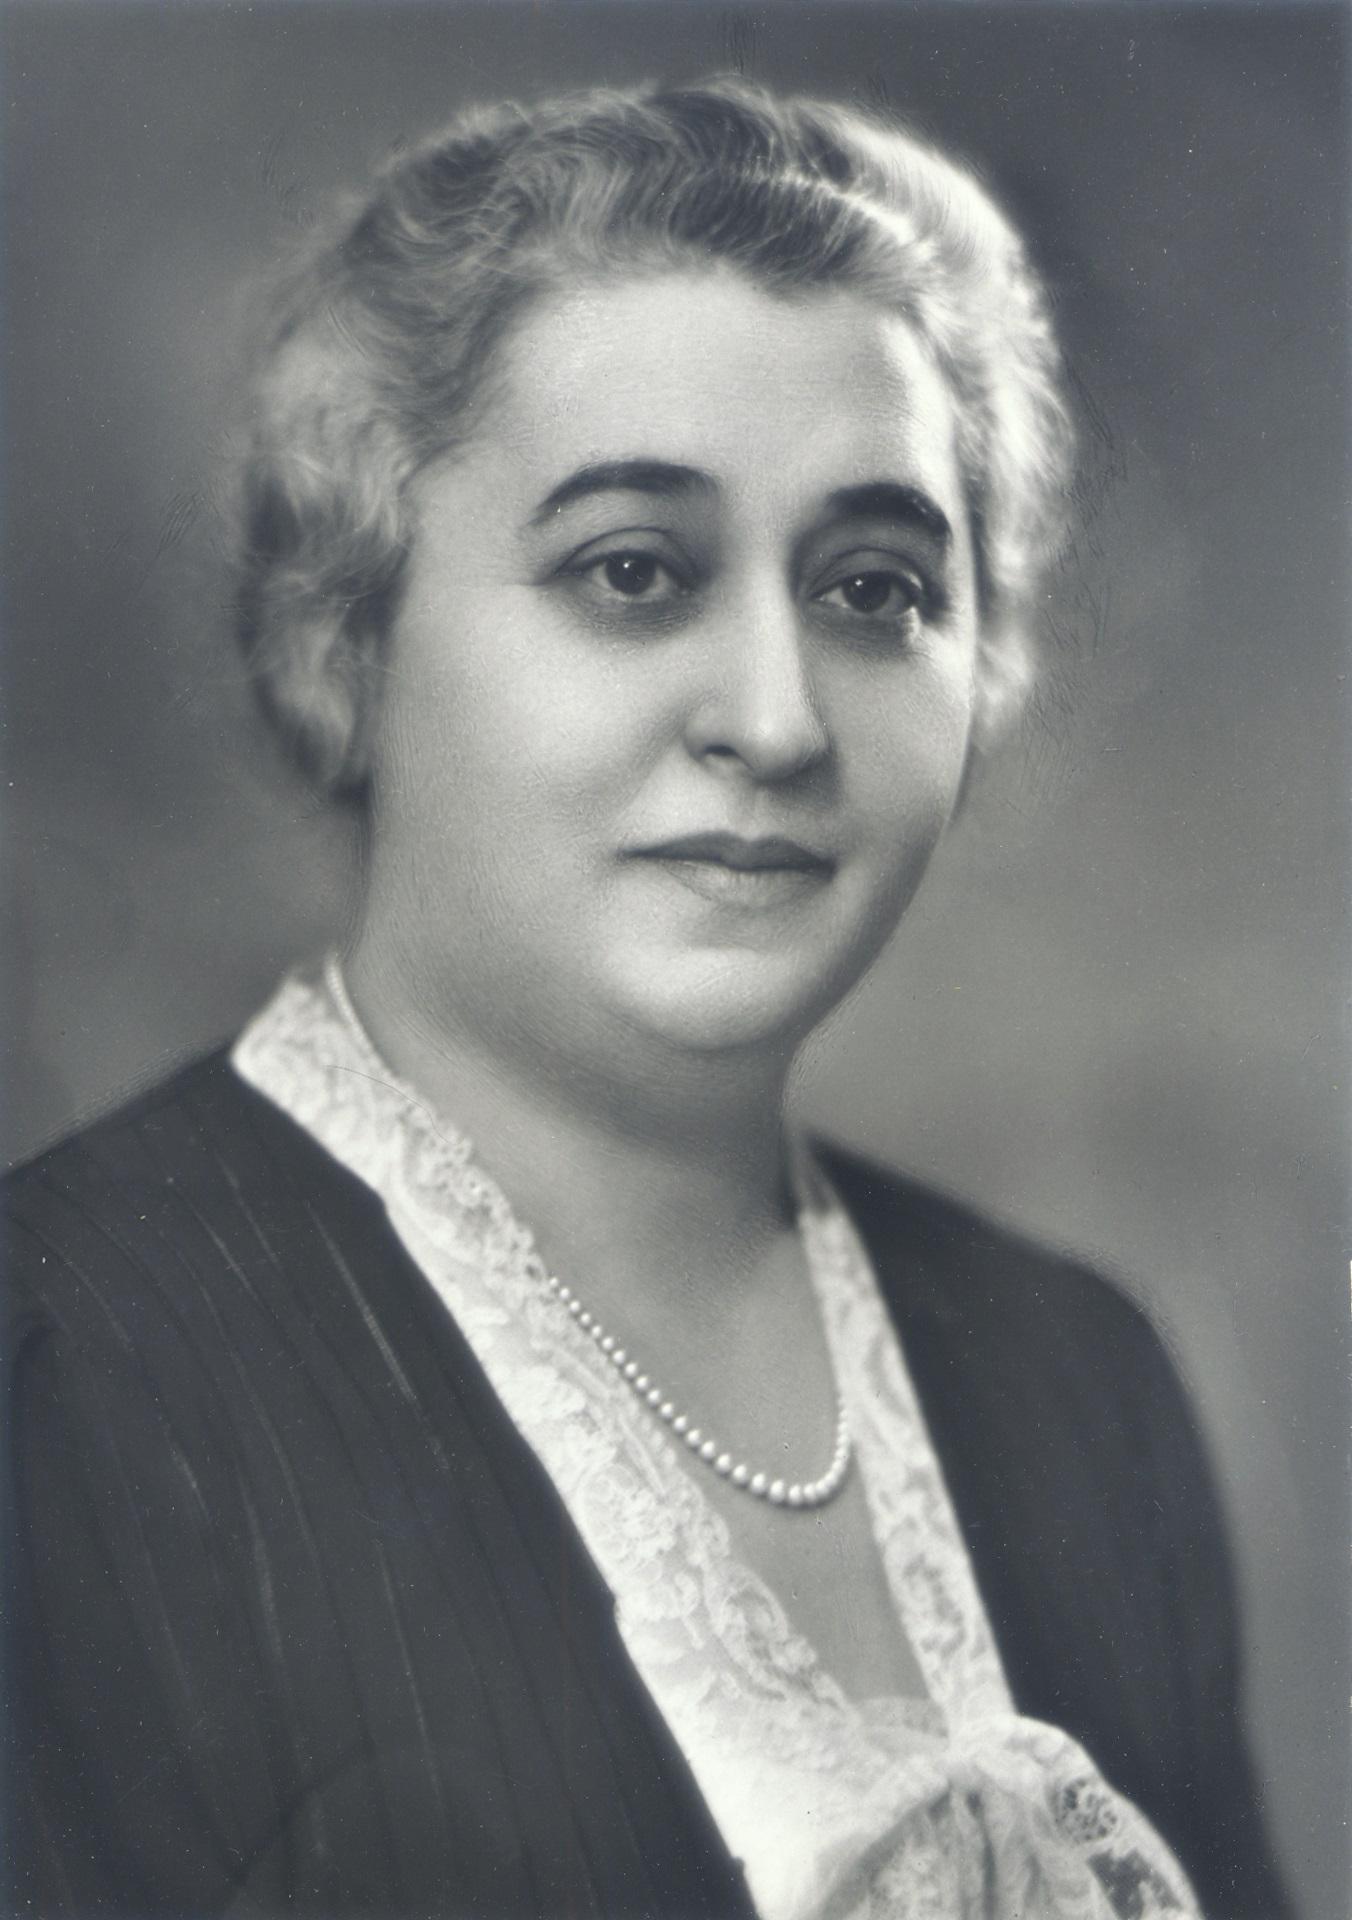 Photographic portrait of Lillian Freiman